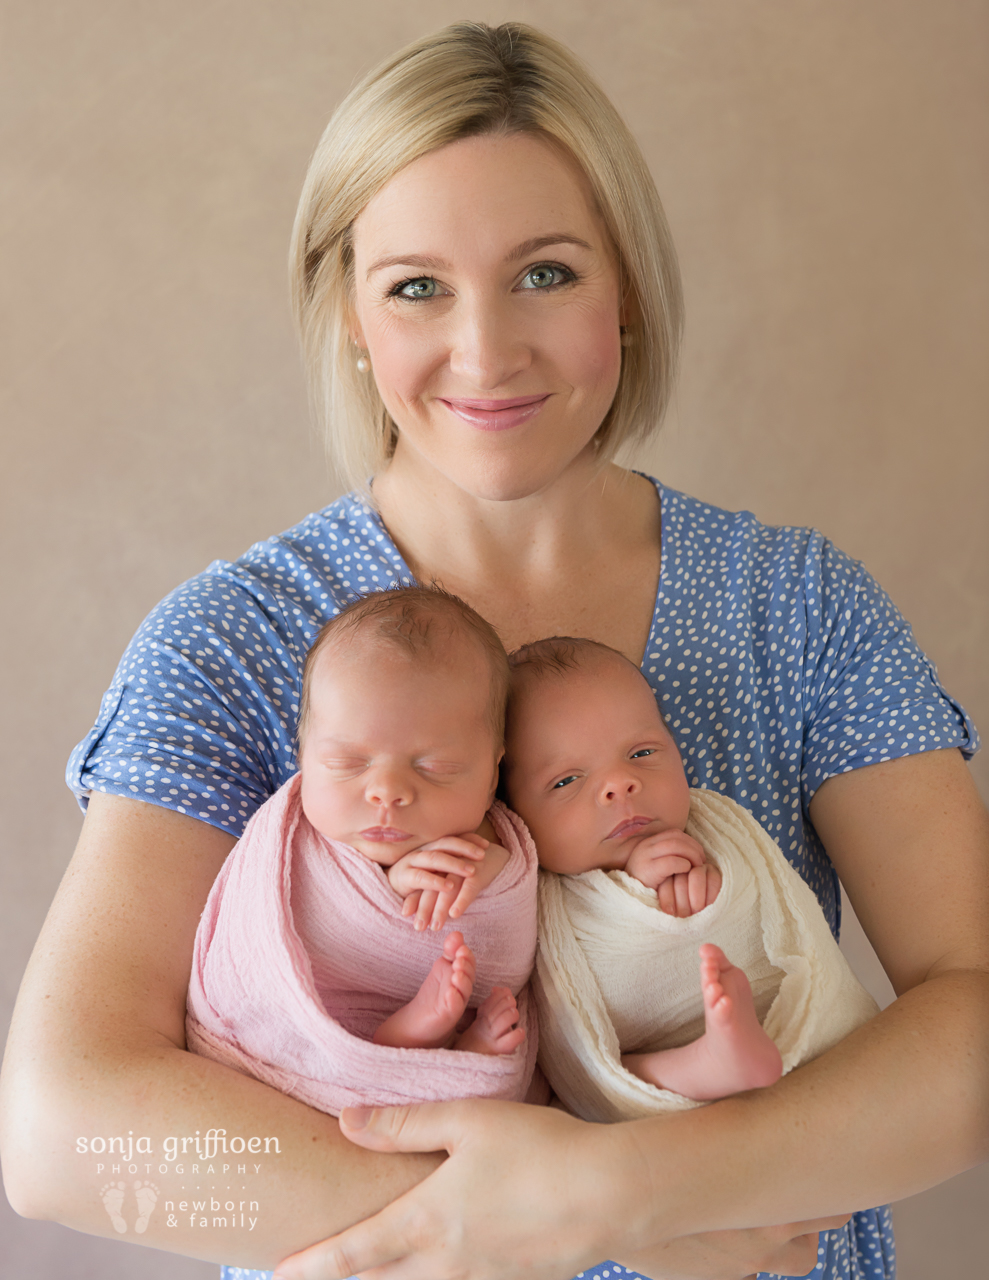 Ruby-Lily-Newborn-Brisbane-Newborn-Photographer-Sonja-Griffioen-05.jpg